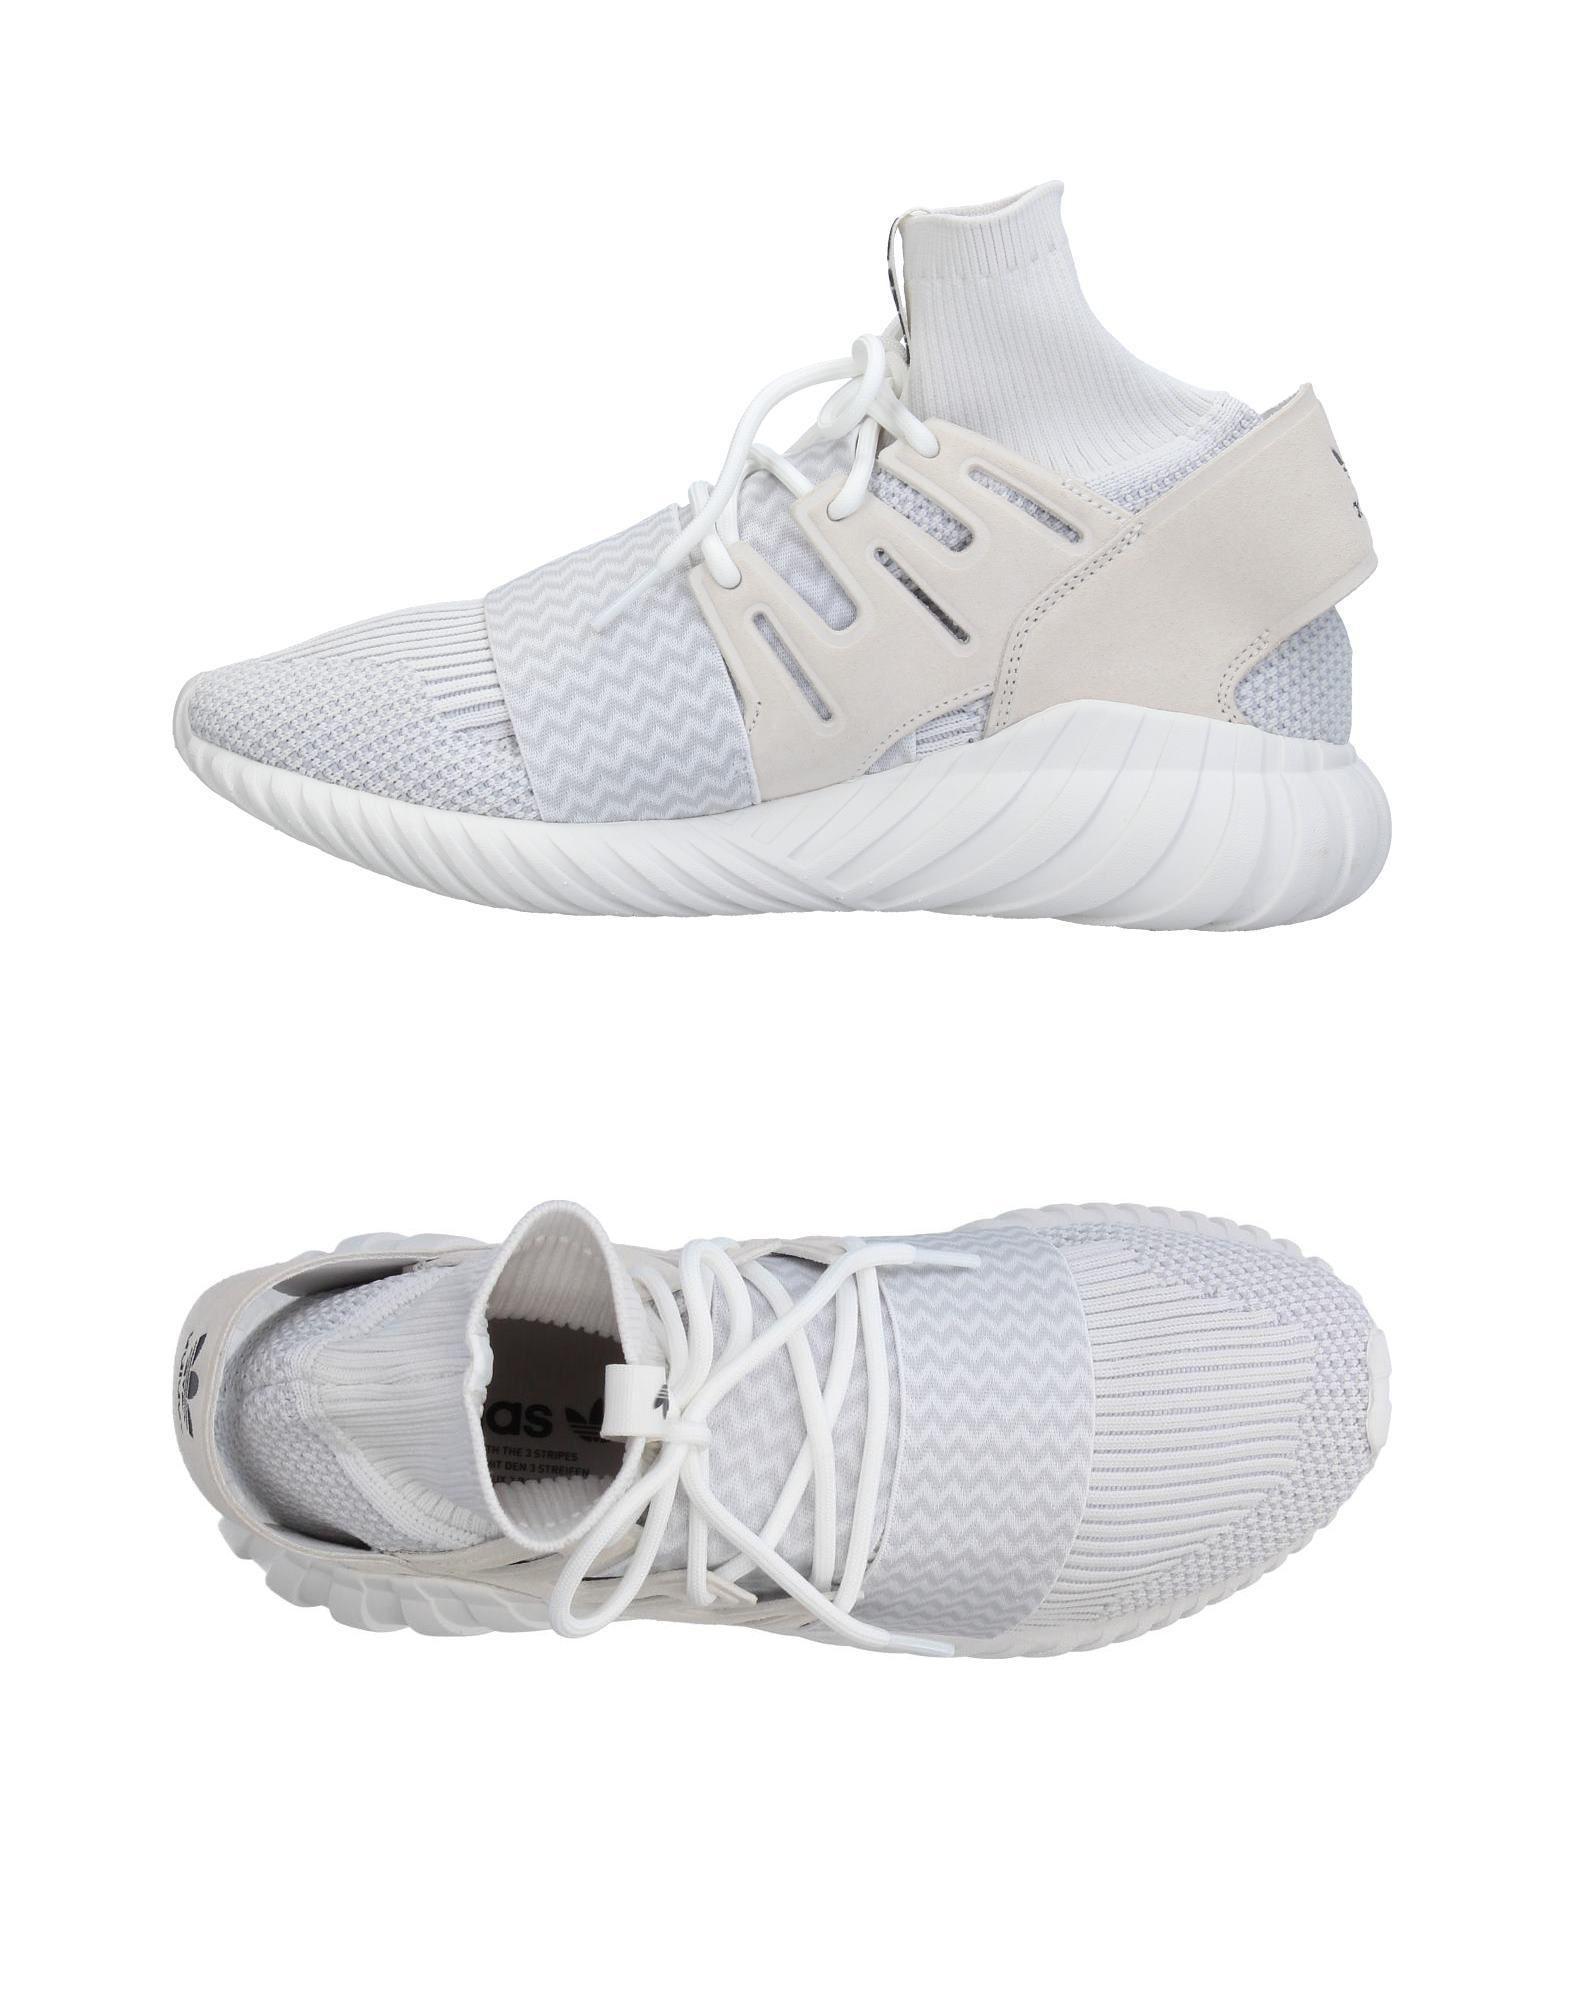 Chaussures Casual Adidas Originals Superstar BlancOrBleu